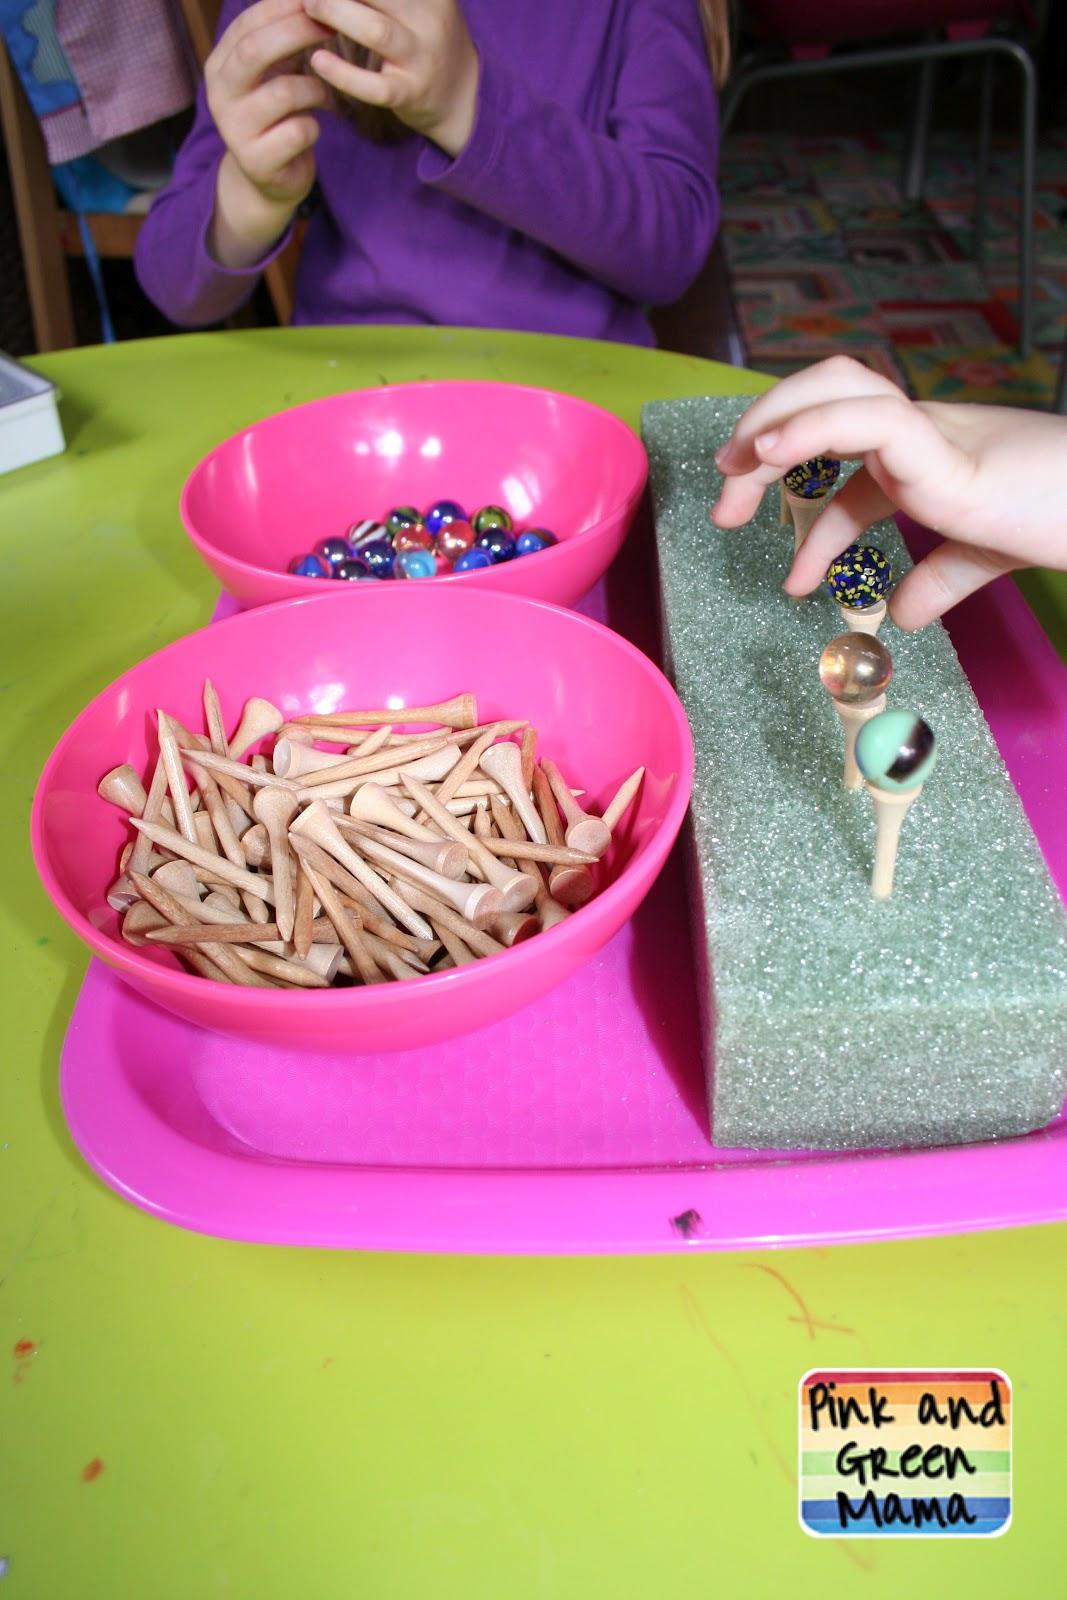 Balancing Marbles (Photo from Pink and Green Mama)